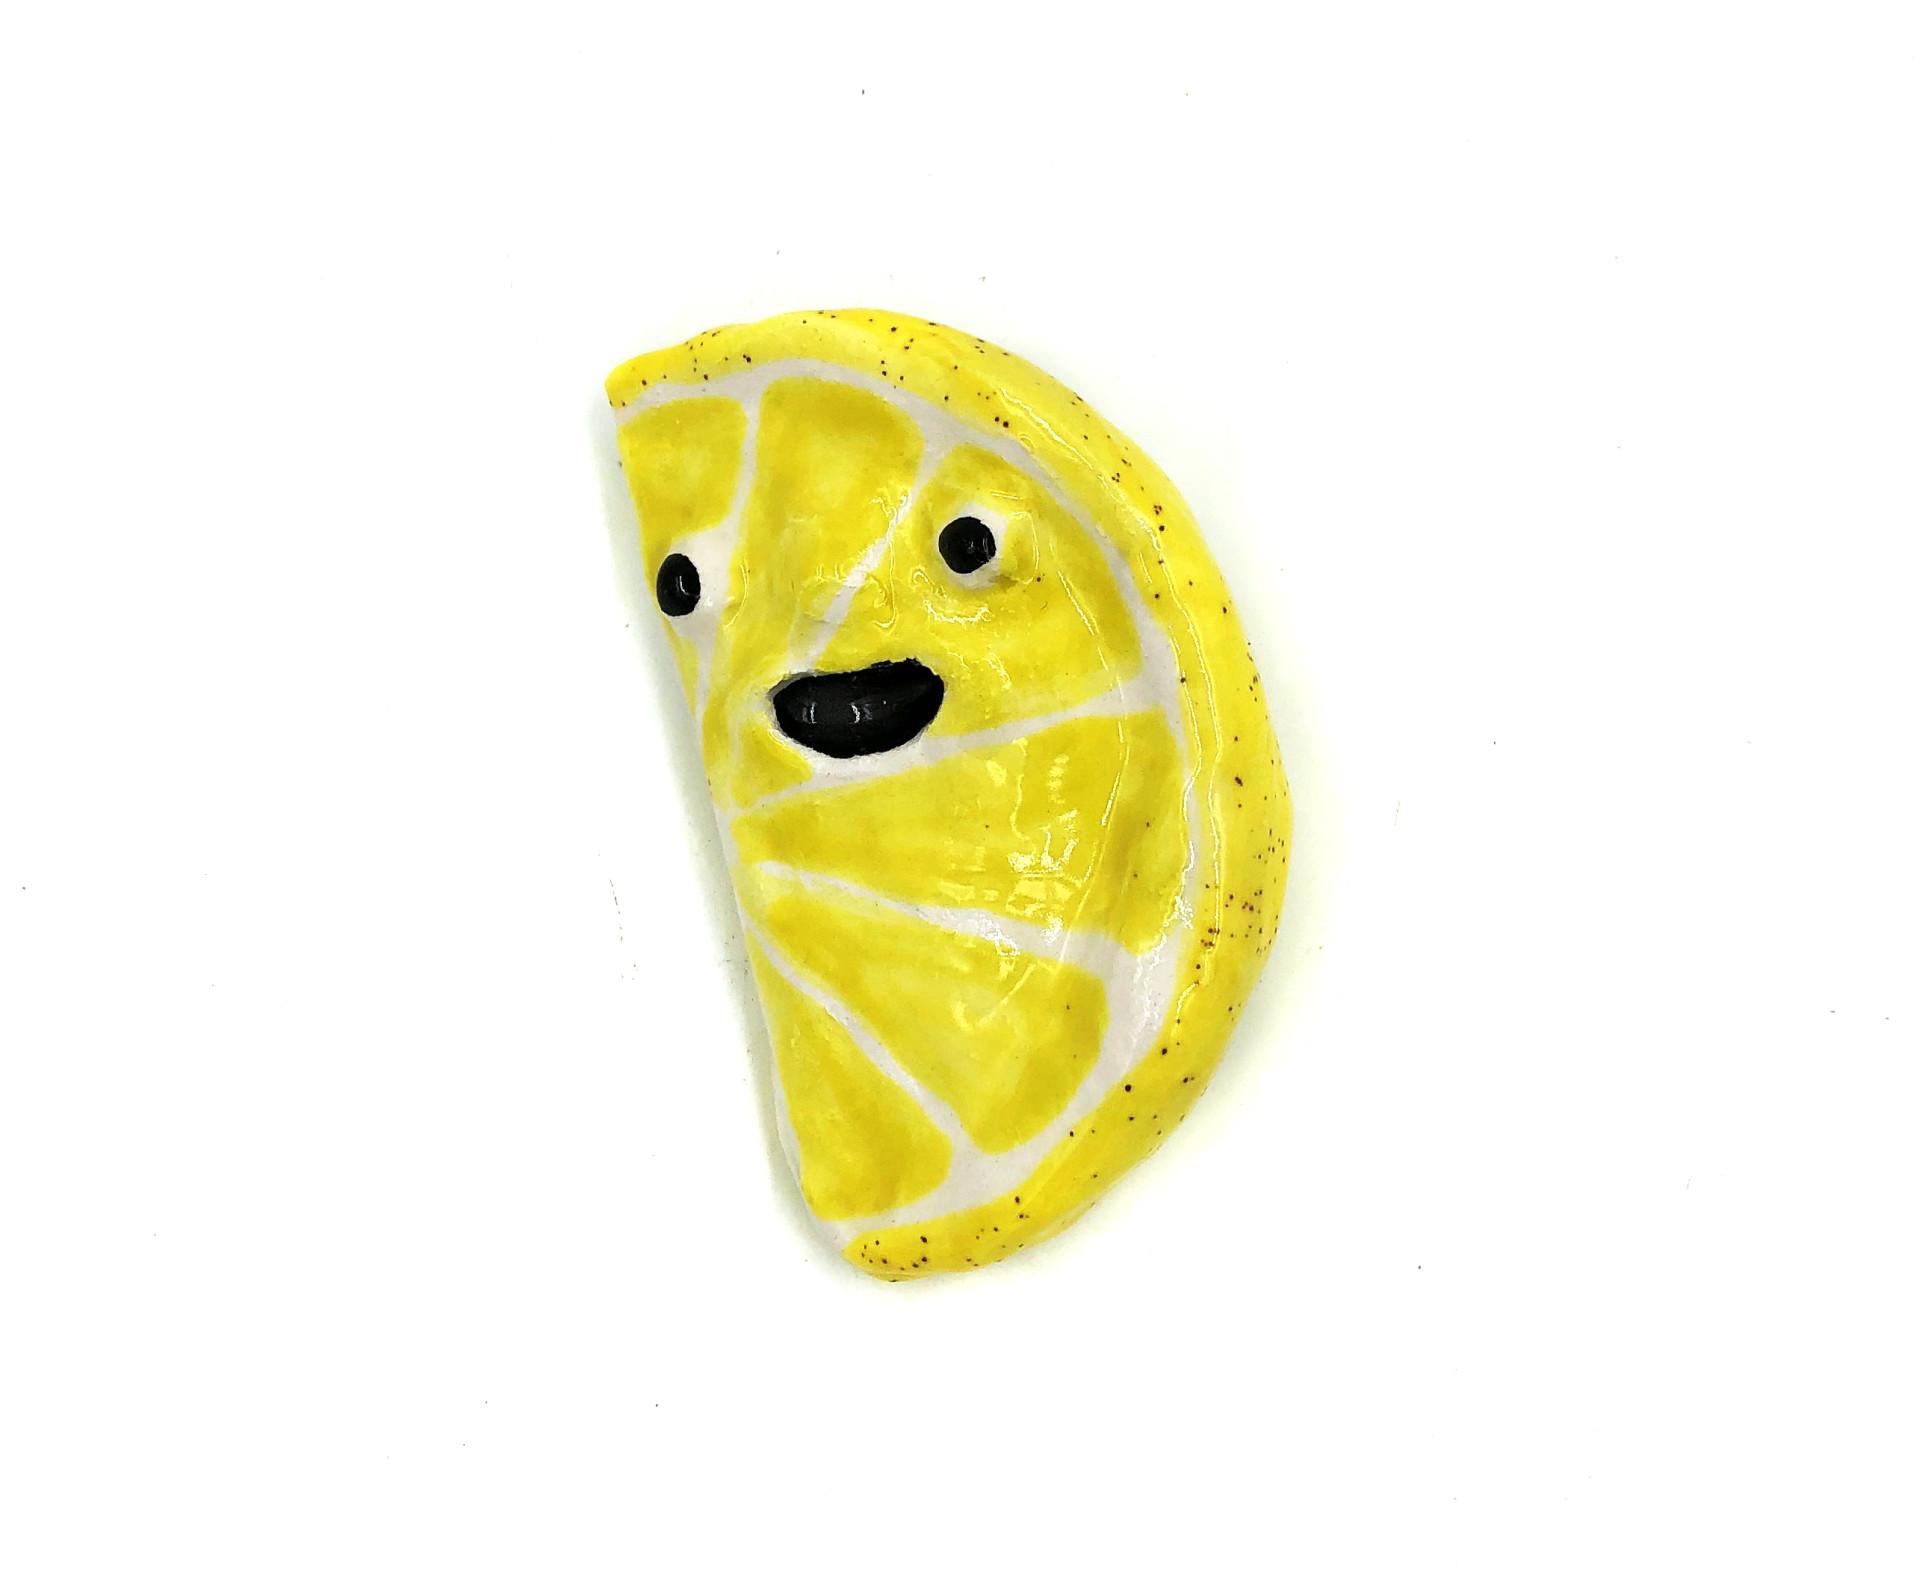 Katie Kimmel, Lemon 2, 2019